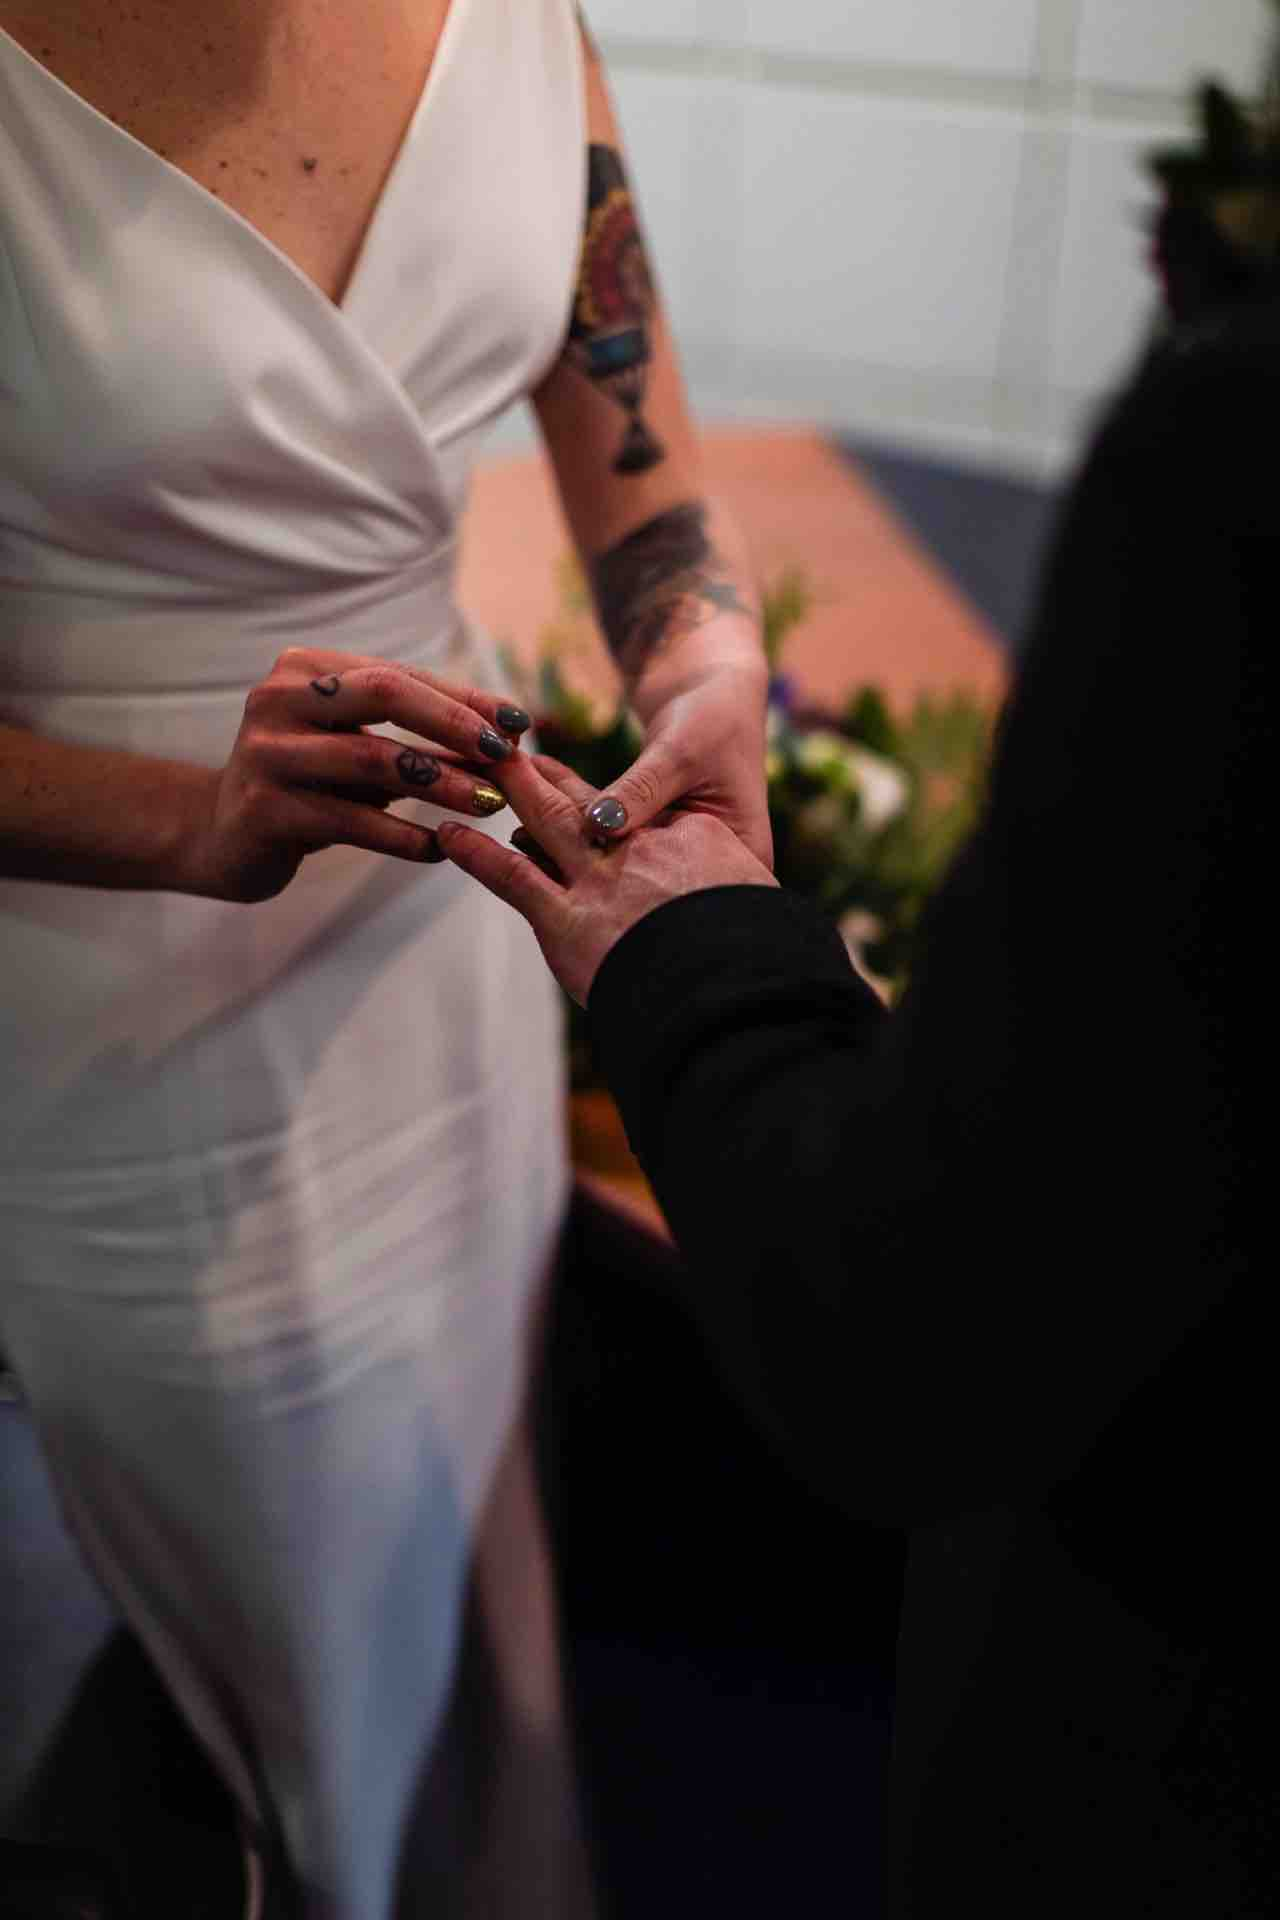 41_MJ ceremony-13_dubiin_wedding_Hotel_office_Registry_photograper_Haddington.jpg